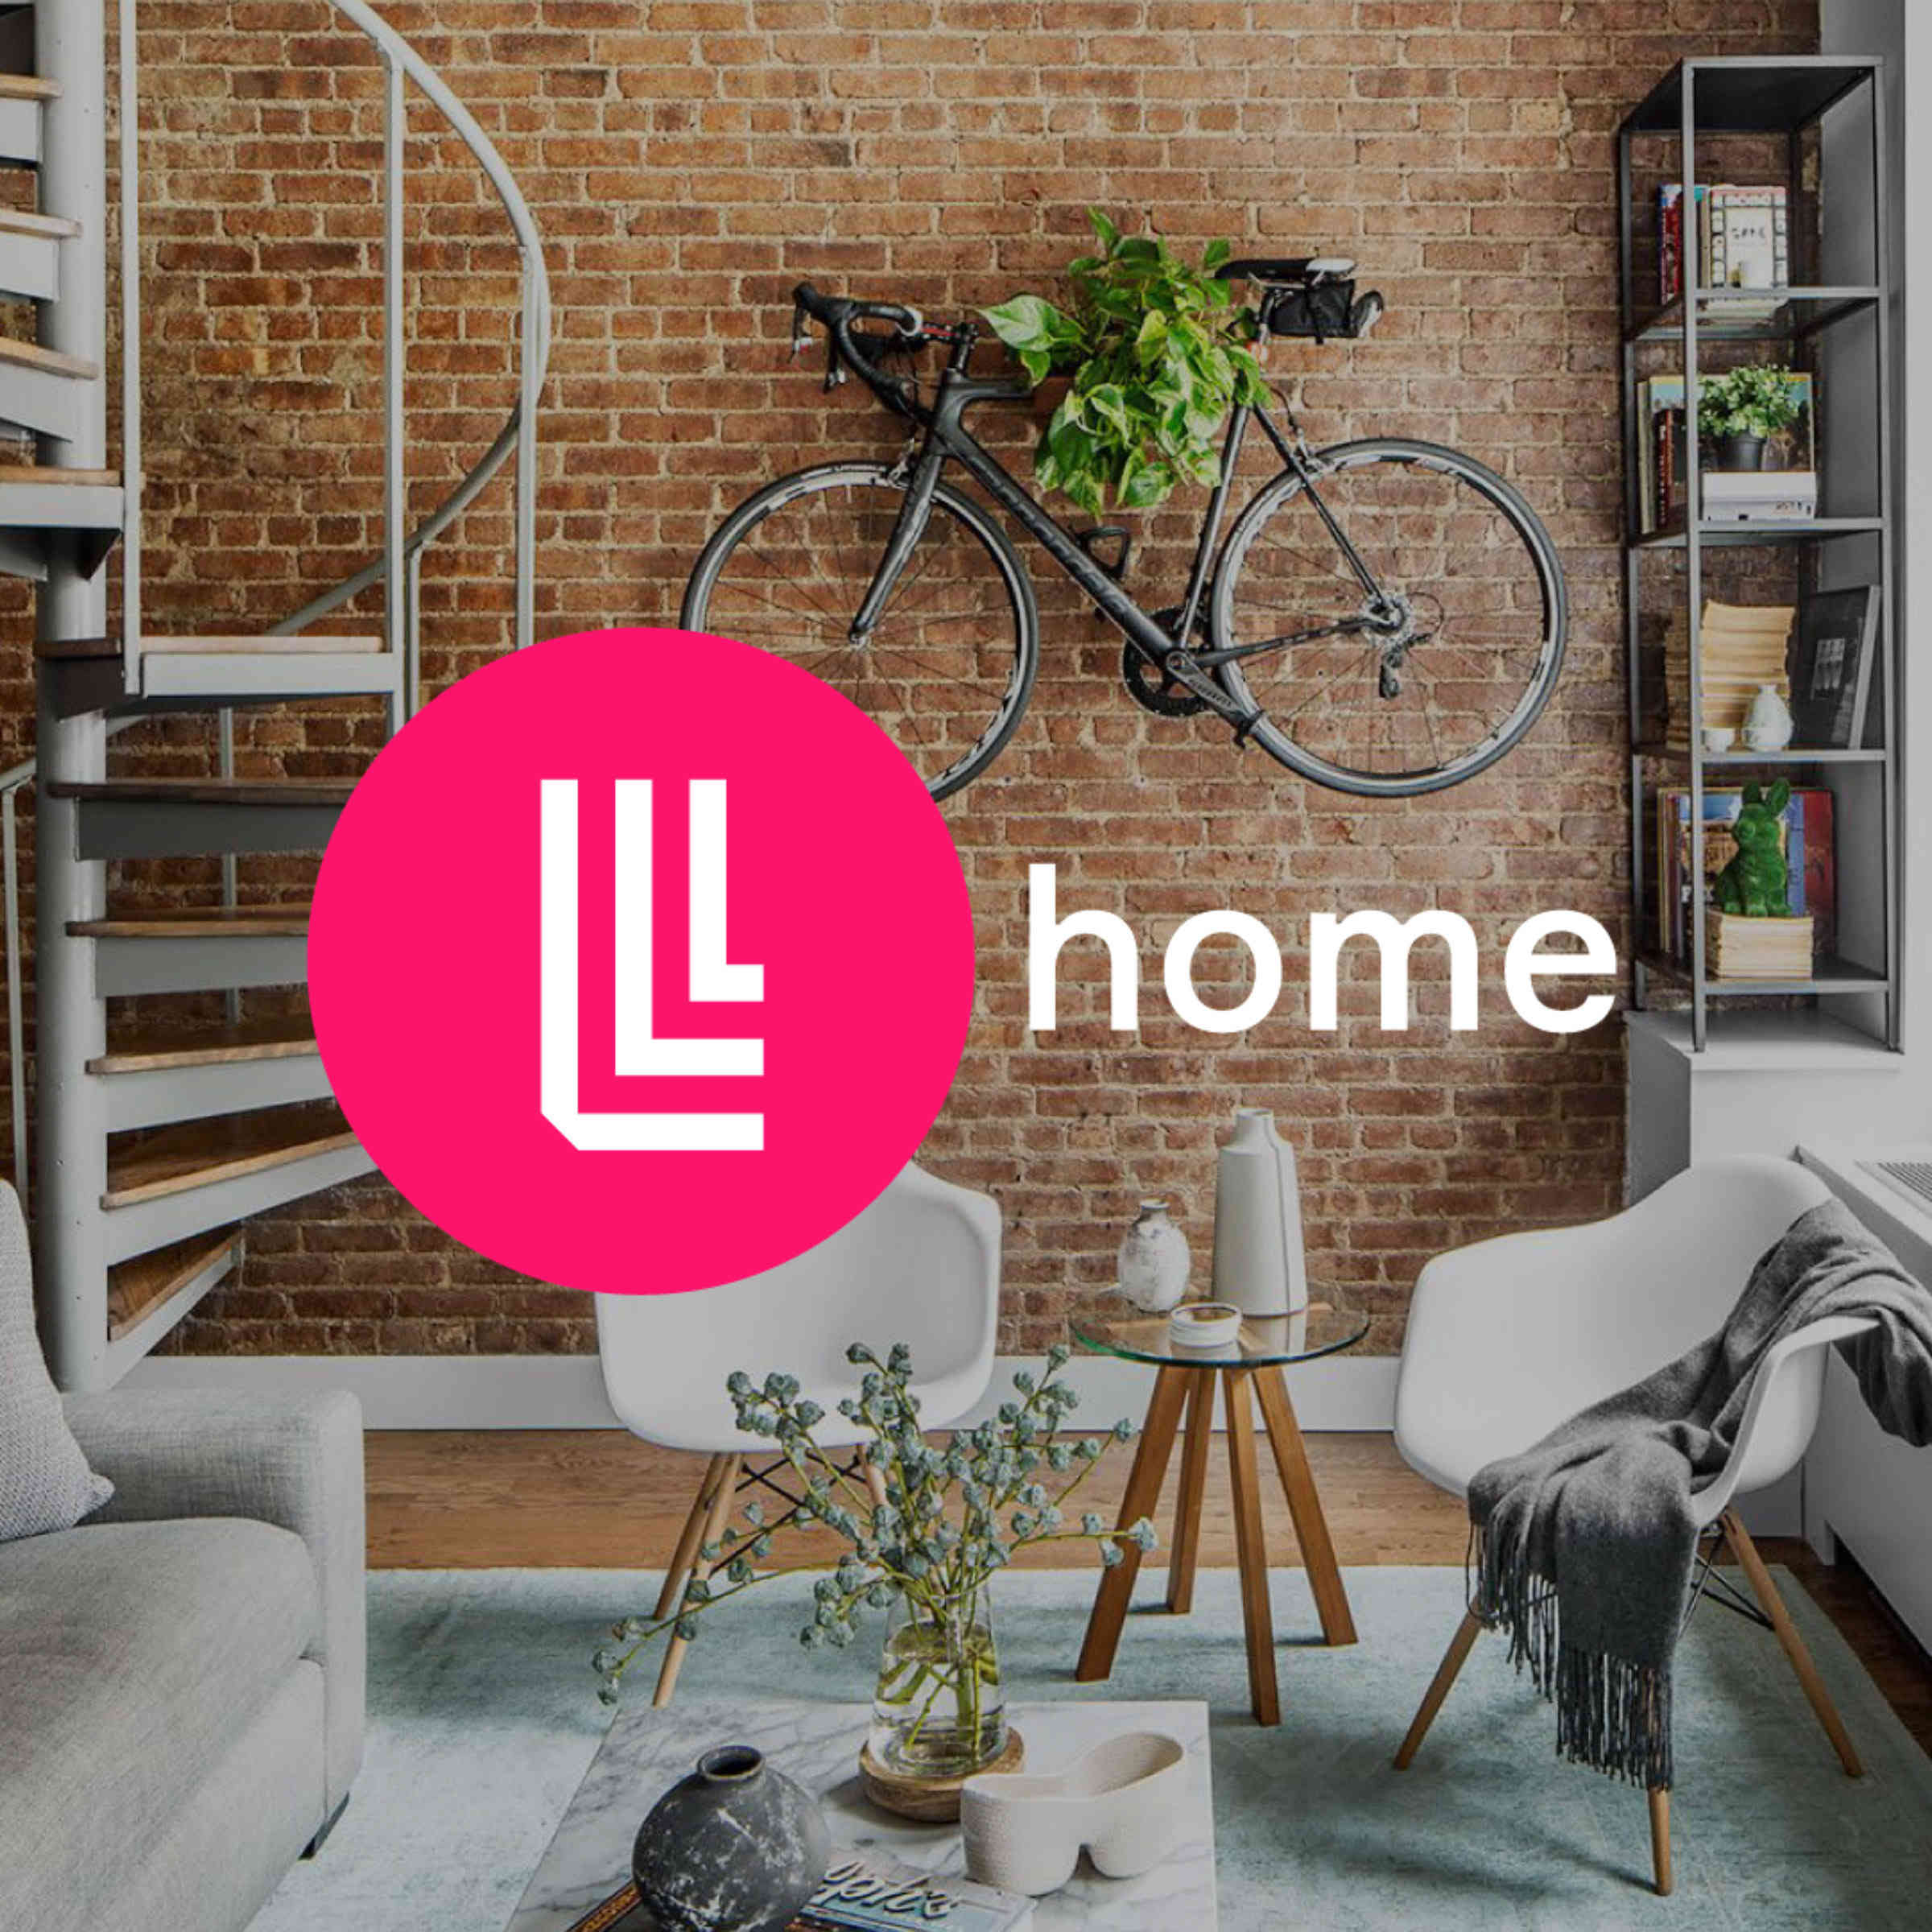 Lifespring Home